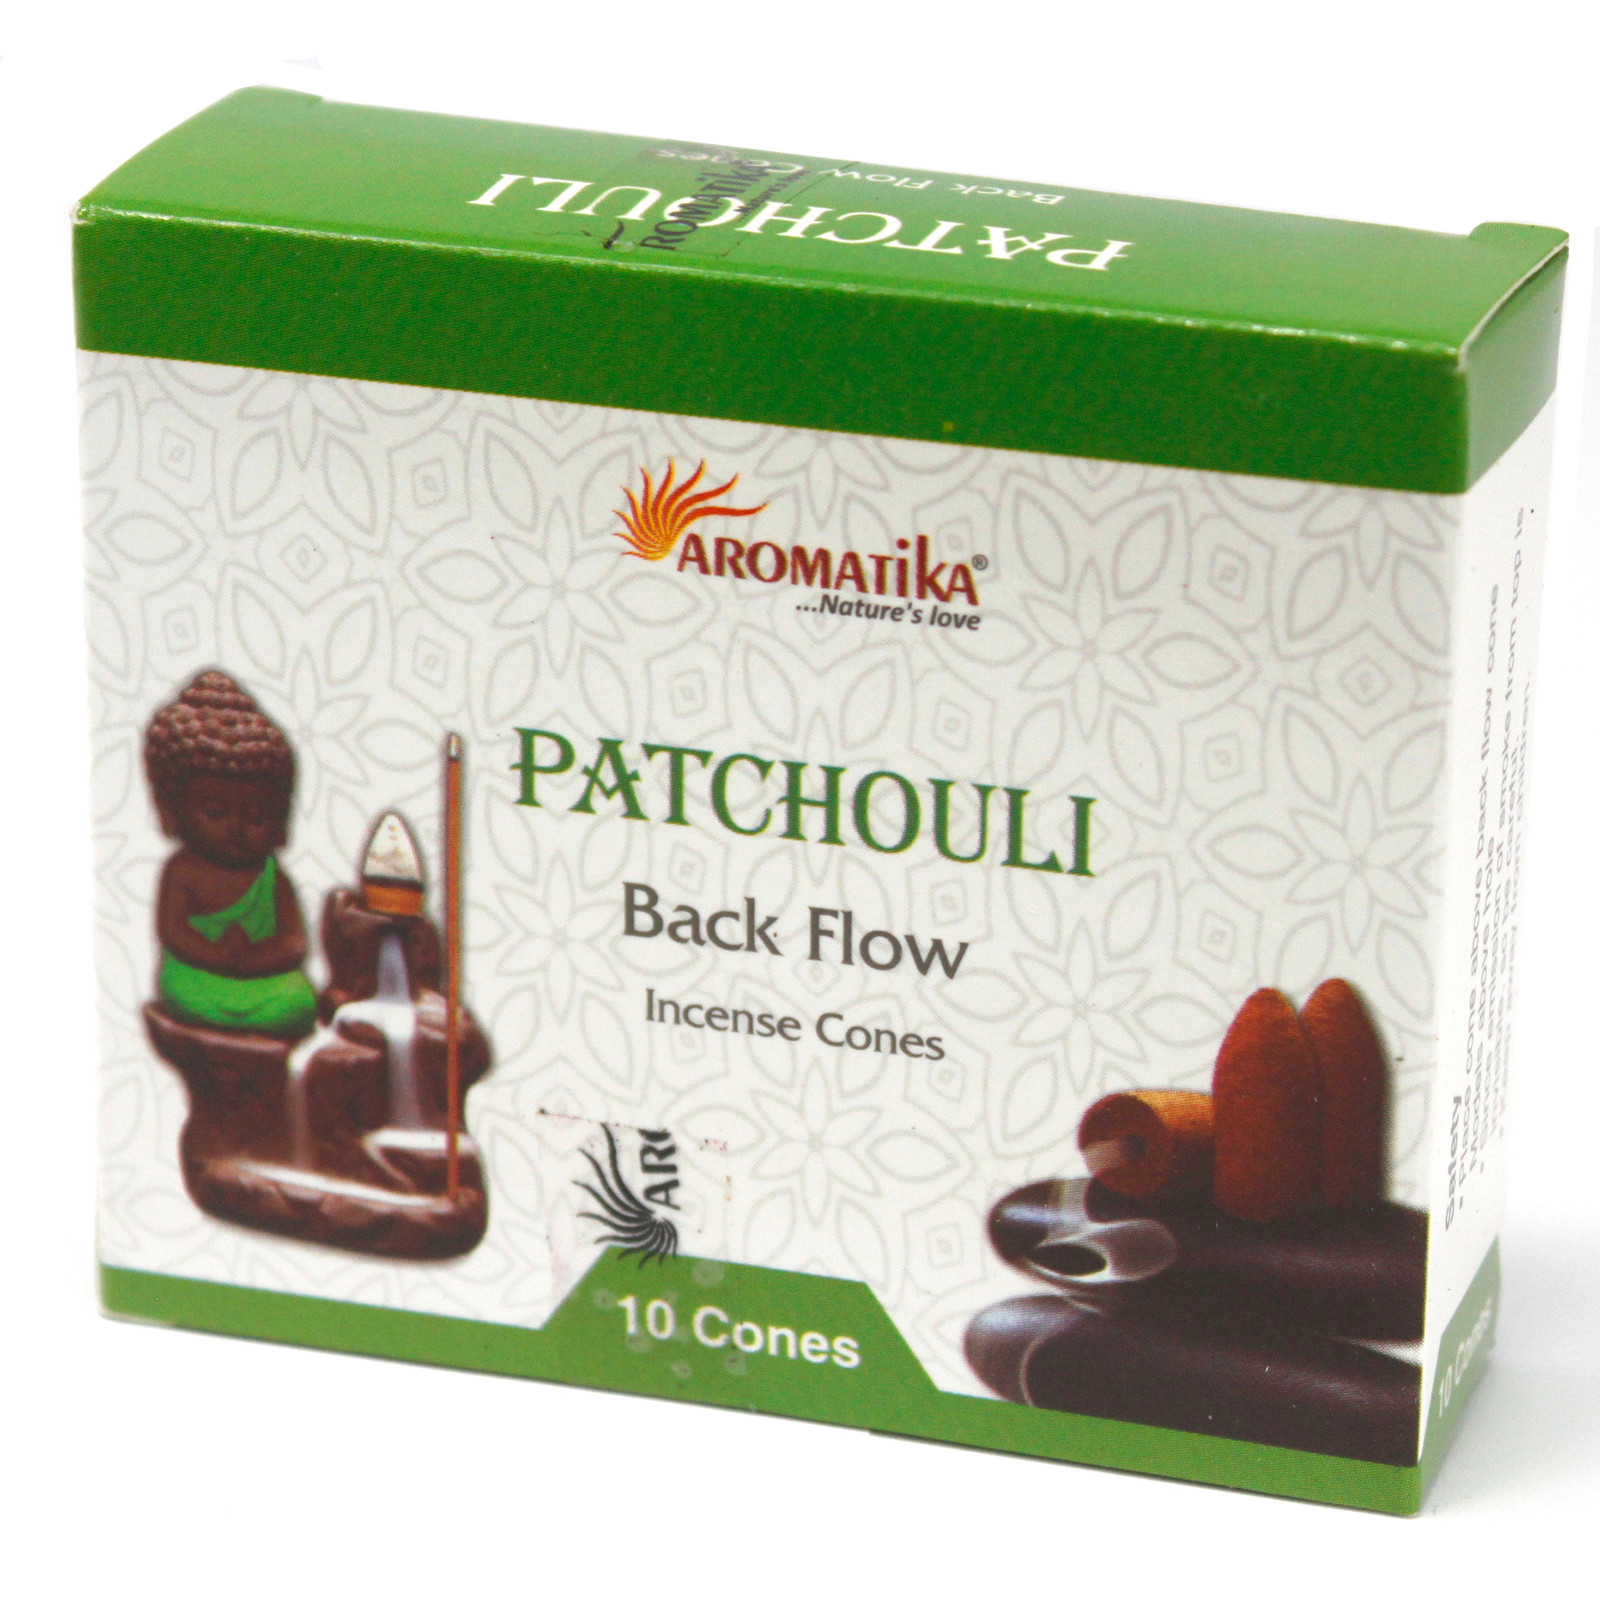 Aromatica Backflow Incense Cones Patchouli